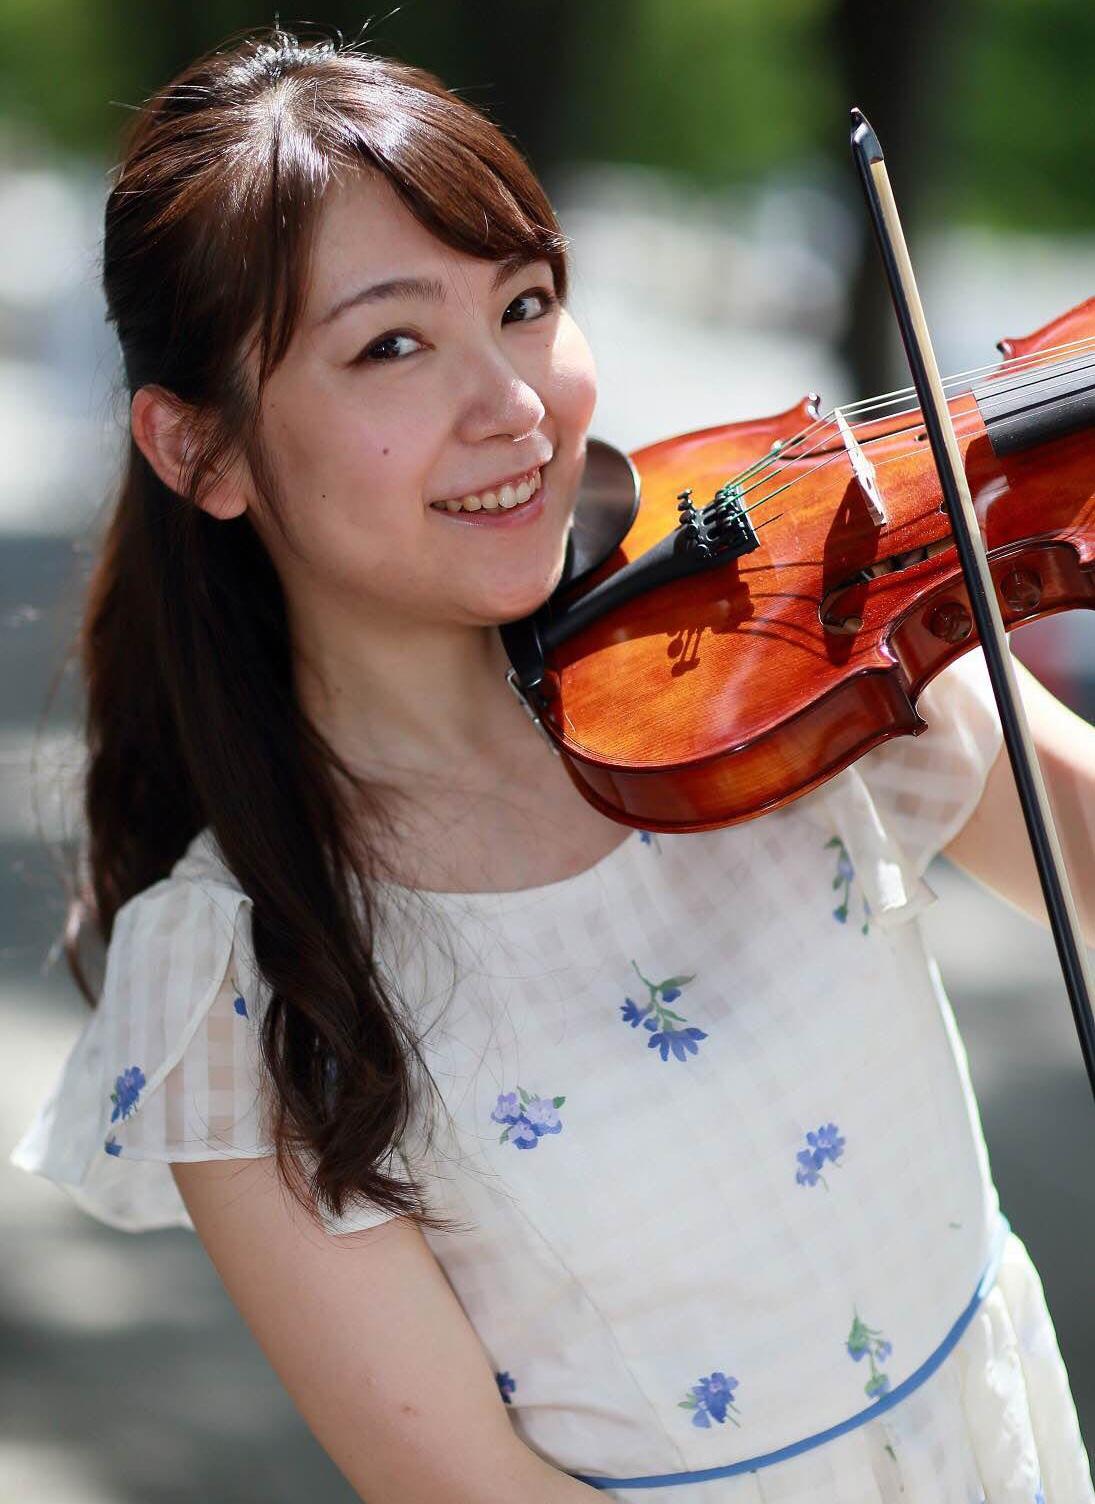 小夜子 ヴァイオリン